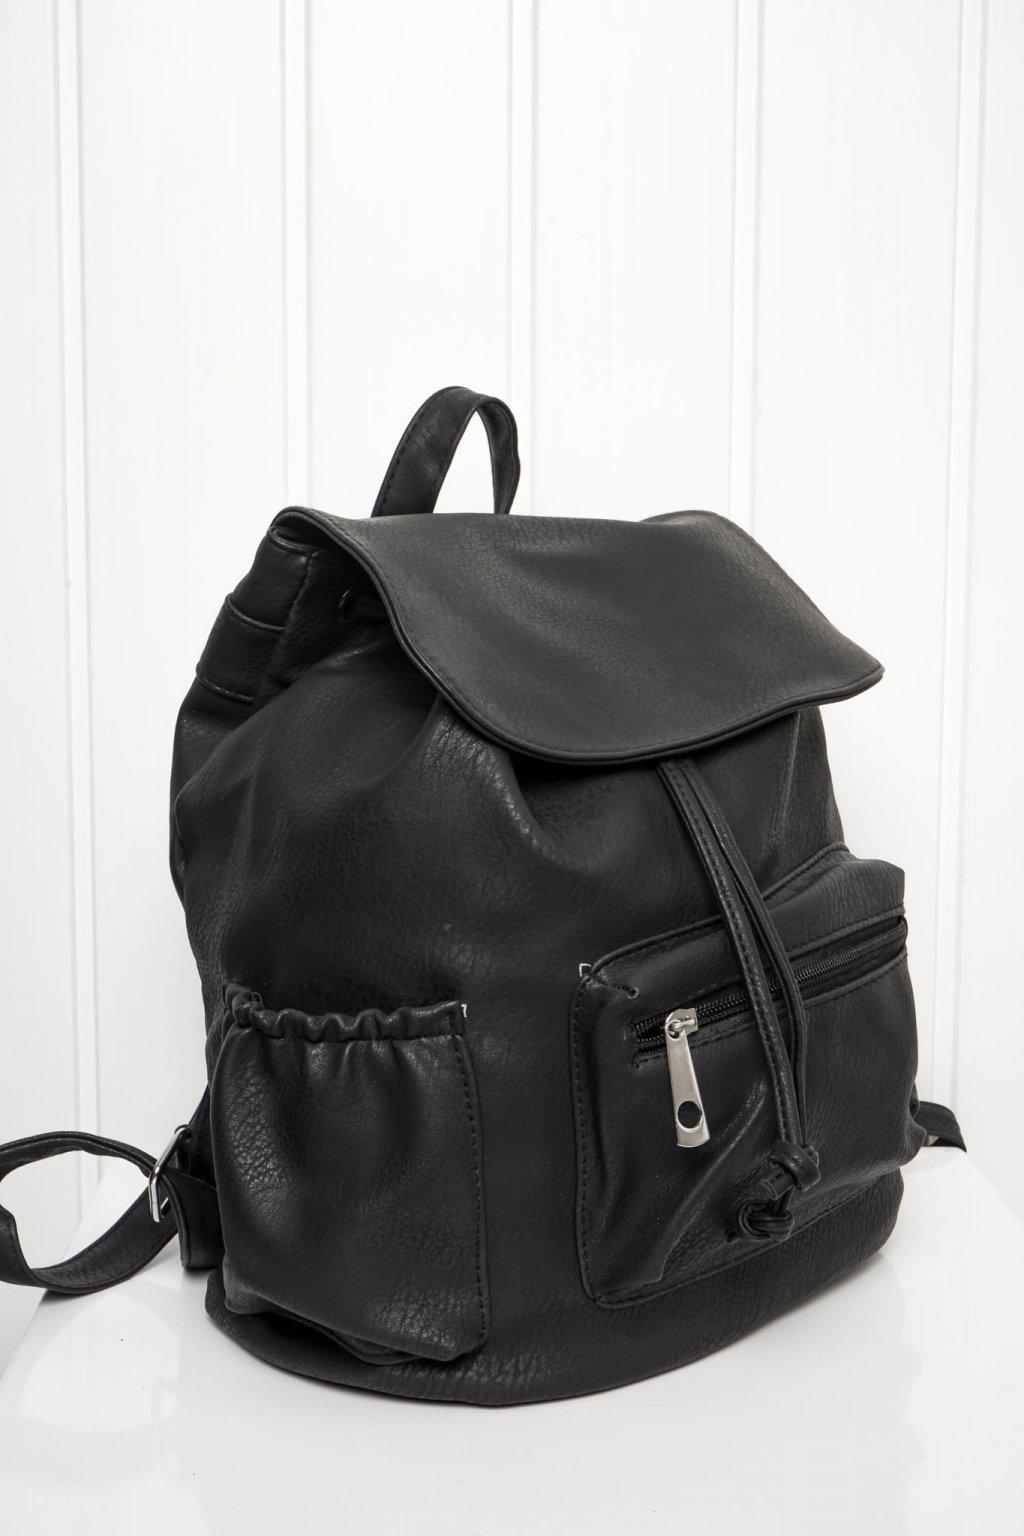 Kabelka, crossbody, ruksak, shopping bag, shopperka, 428